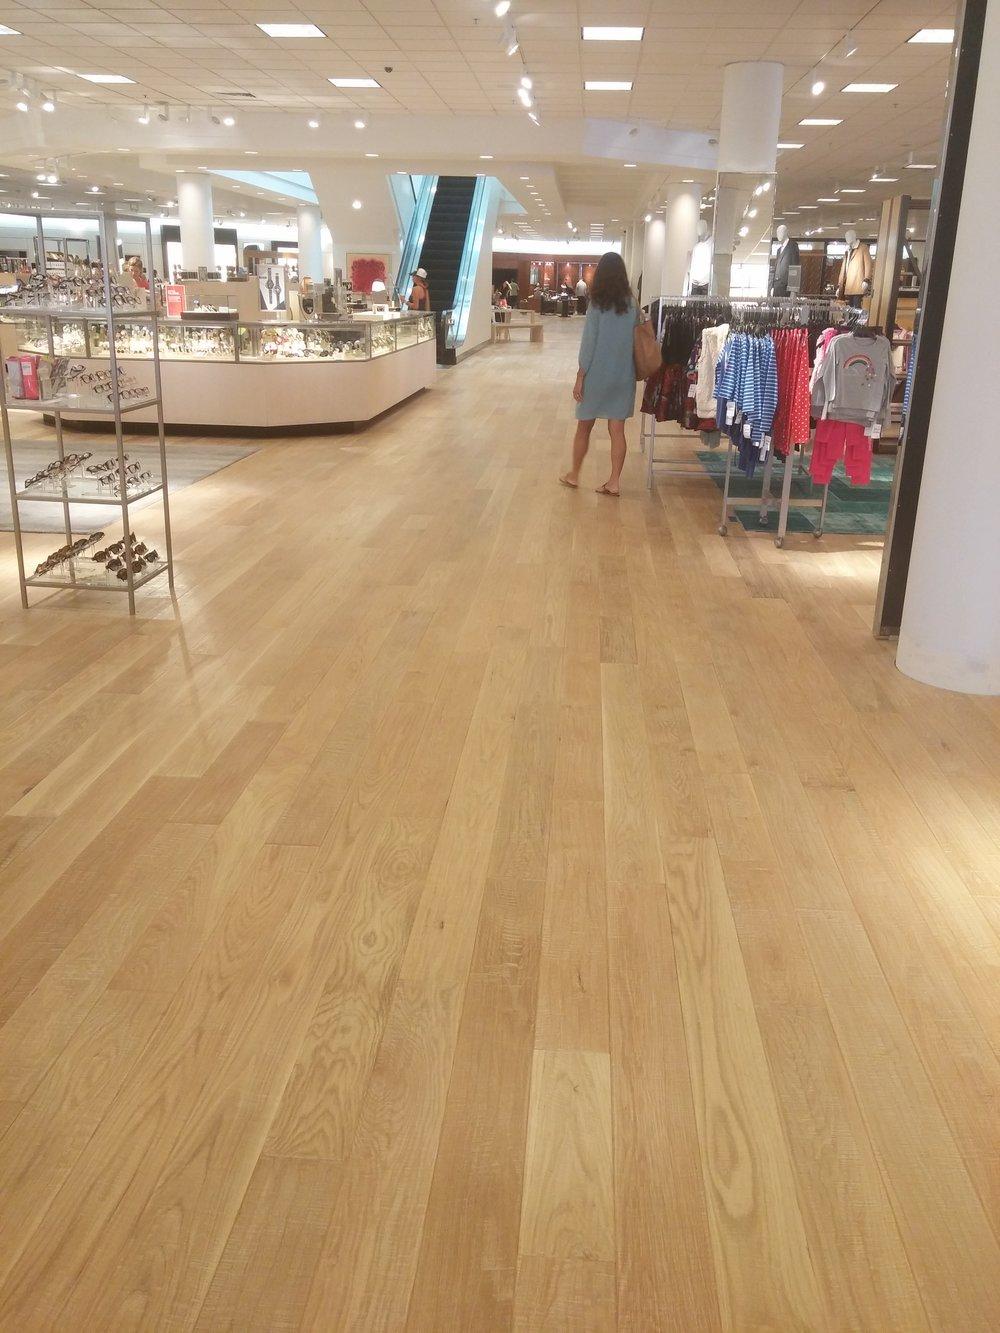 Major Retail-0001.jpg